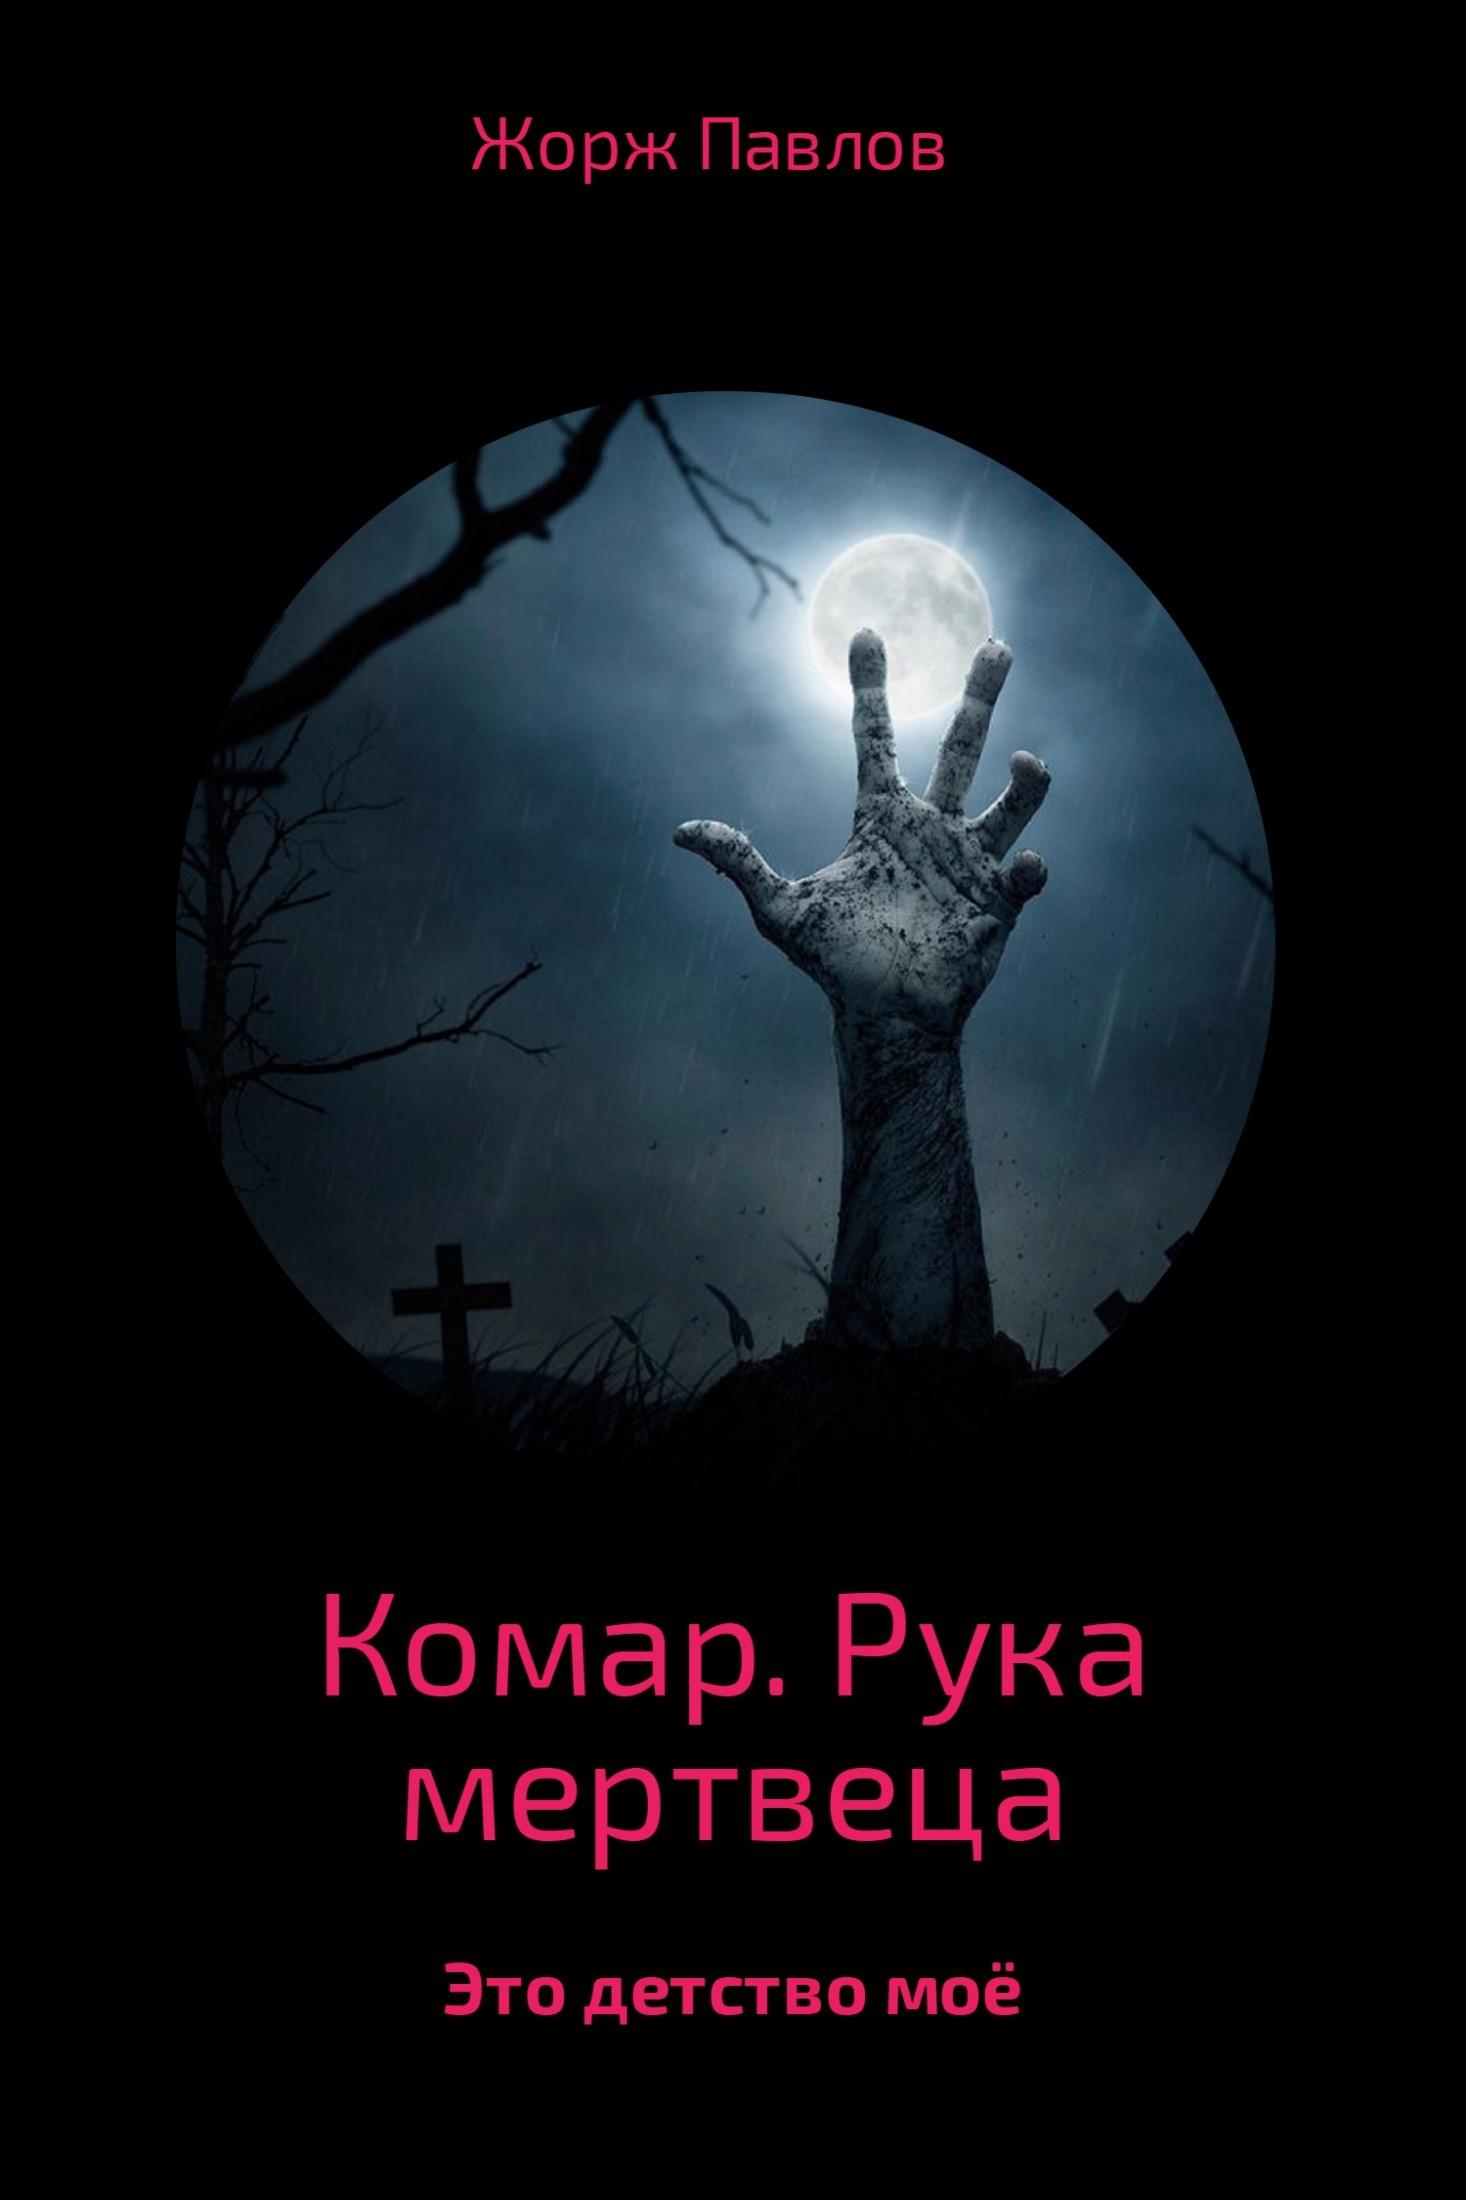 Жорж Павлов Комар. Рука мертвеца детство лидера